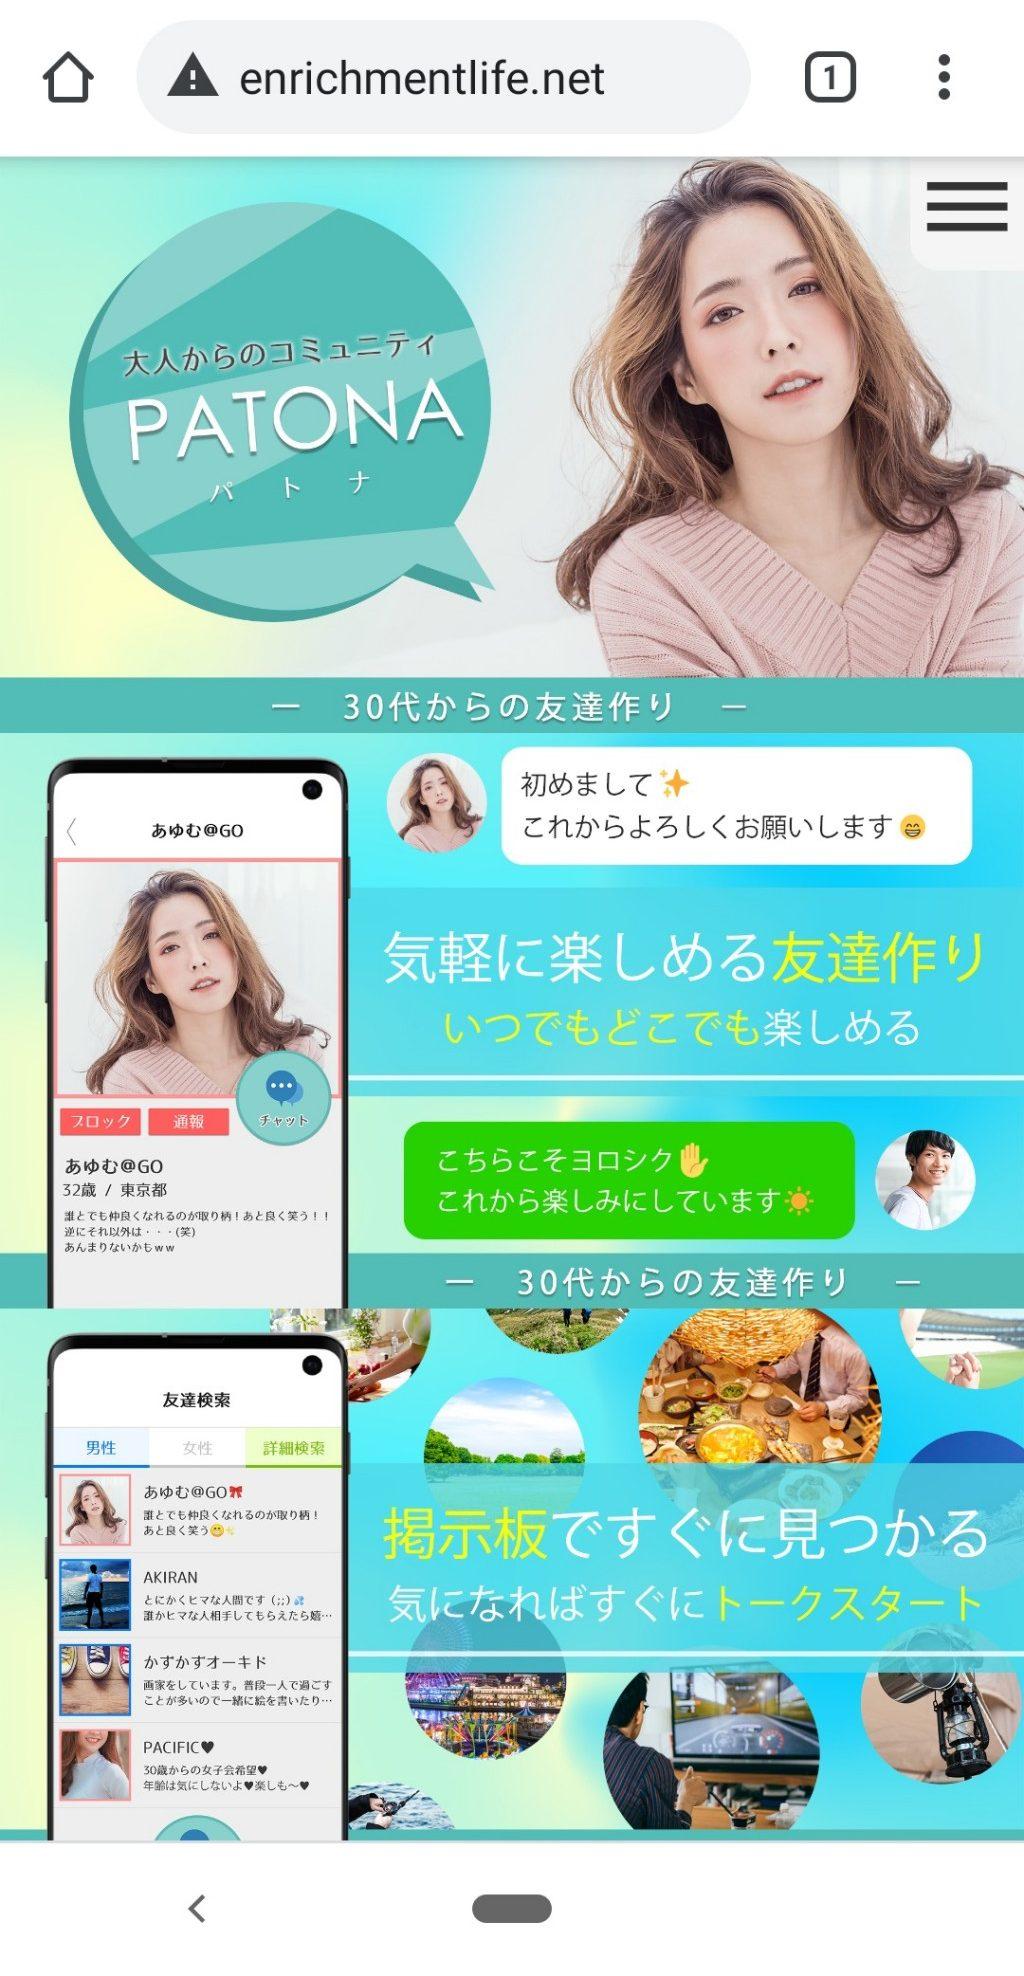 Screenshot 20210208 112015 e1612789904230 - 「PATONA」はサクラ詐欺アプリ